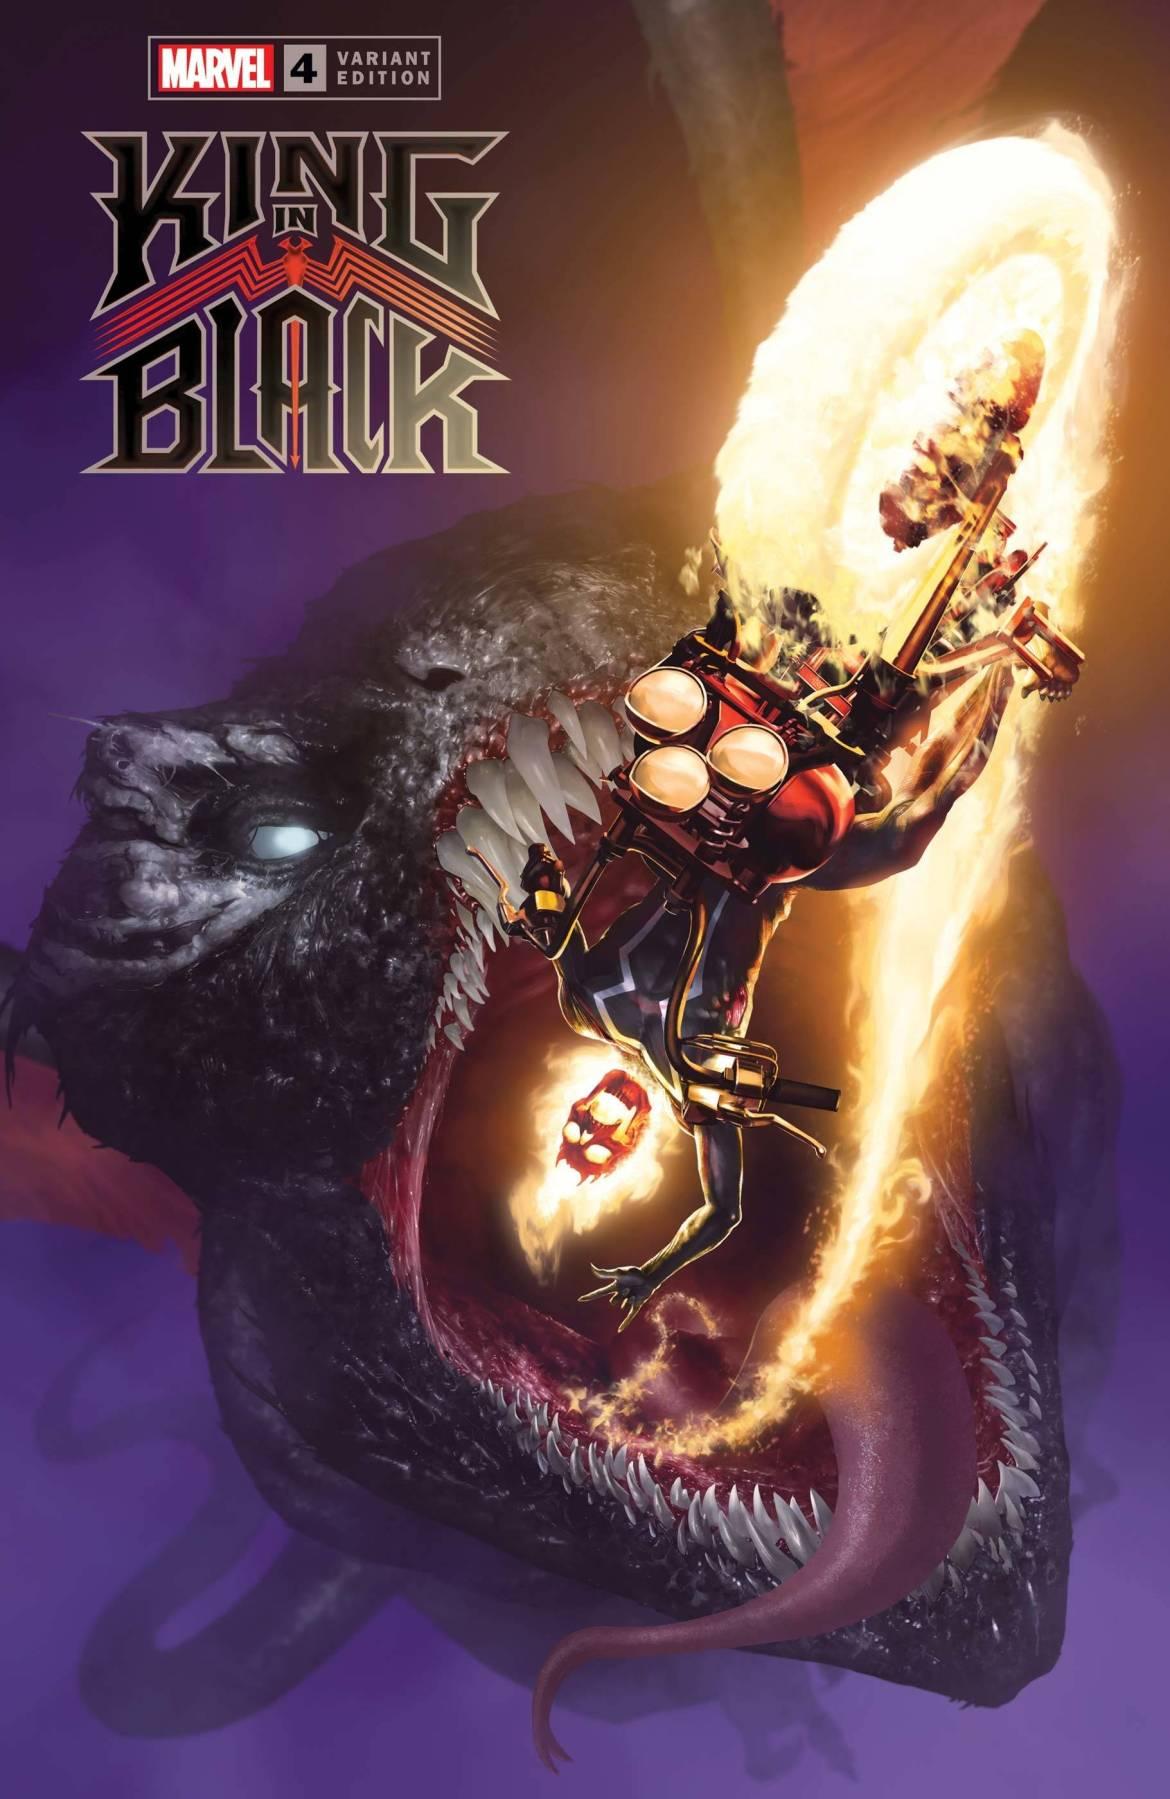 STL177413 ComicList: Marvel Comics New Releases for 02/17/2021